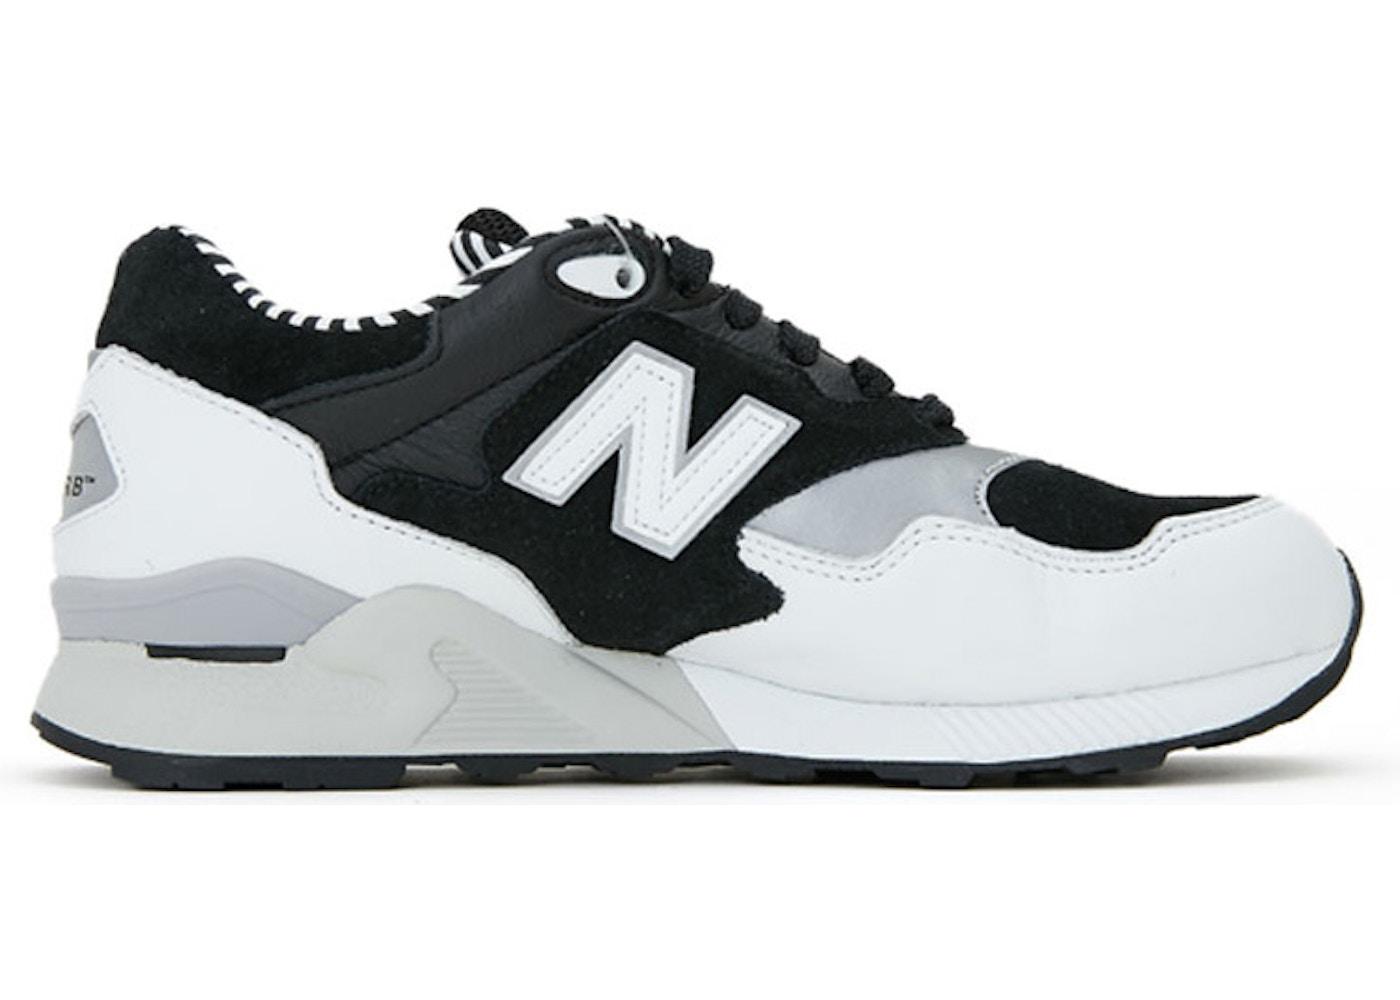 premium selection fcbf2 30eb4 New Balance 878 White/Black-Navy